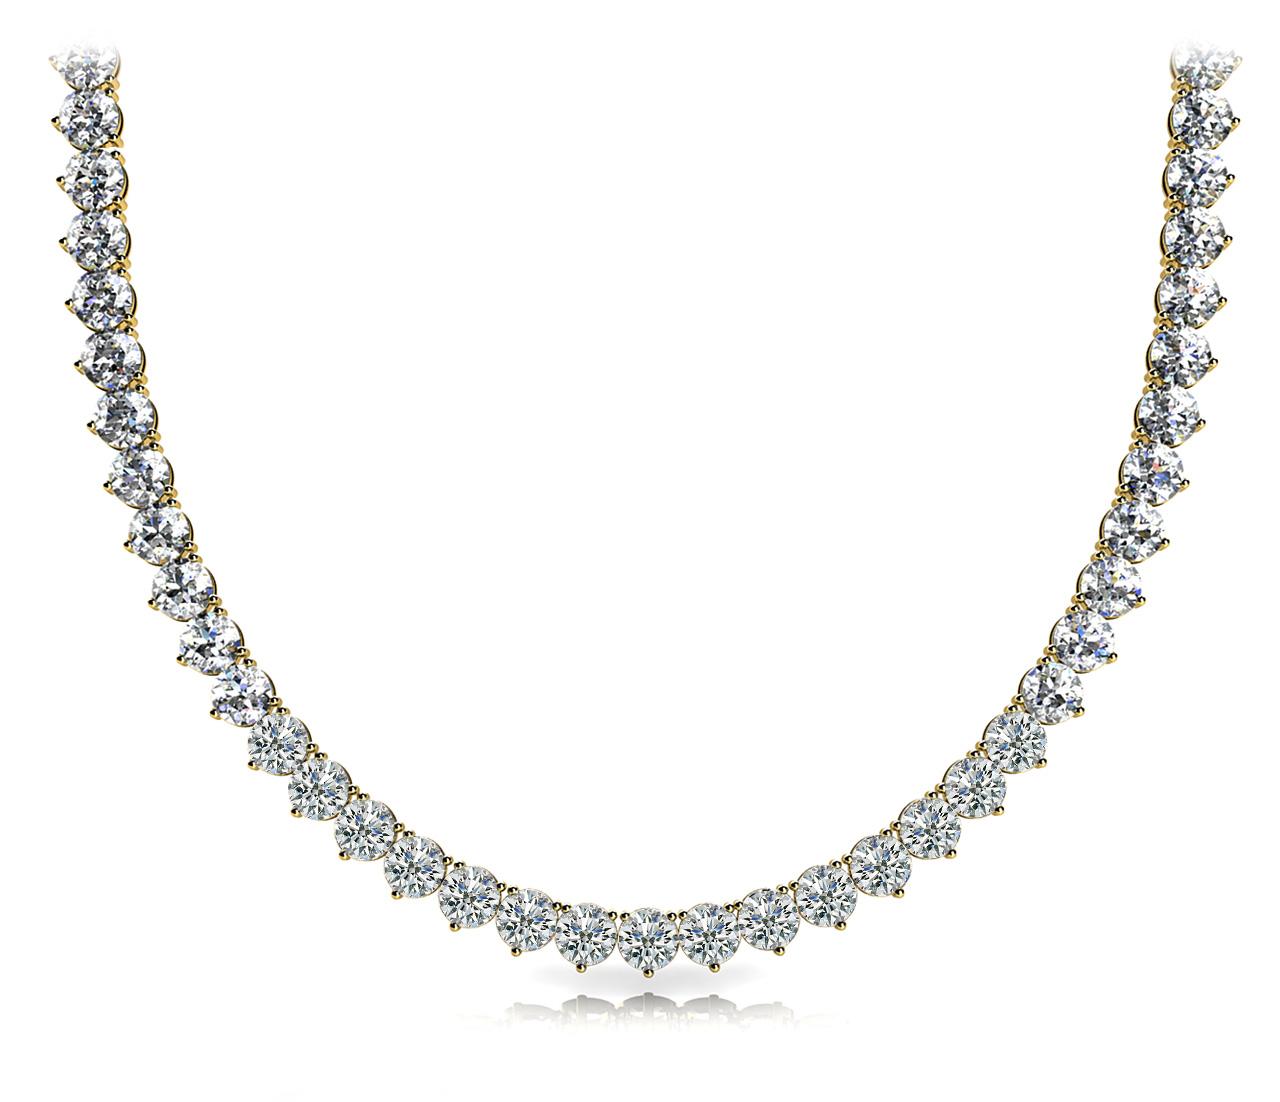 14k-yellow-gold-eternity-diamond-necklace-60024-10